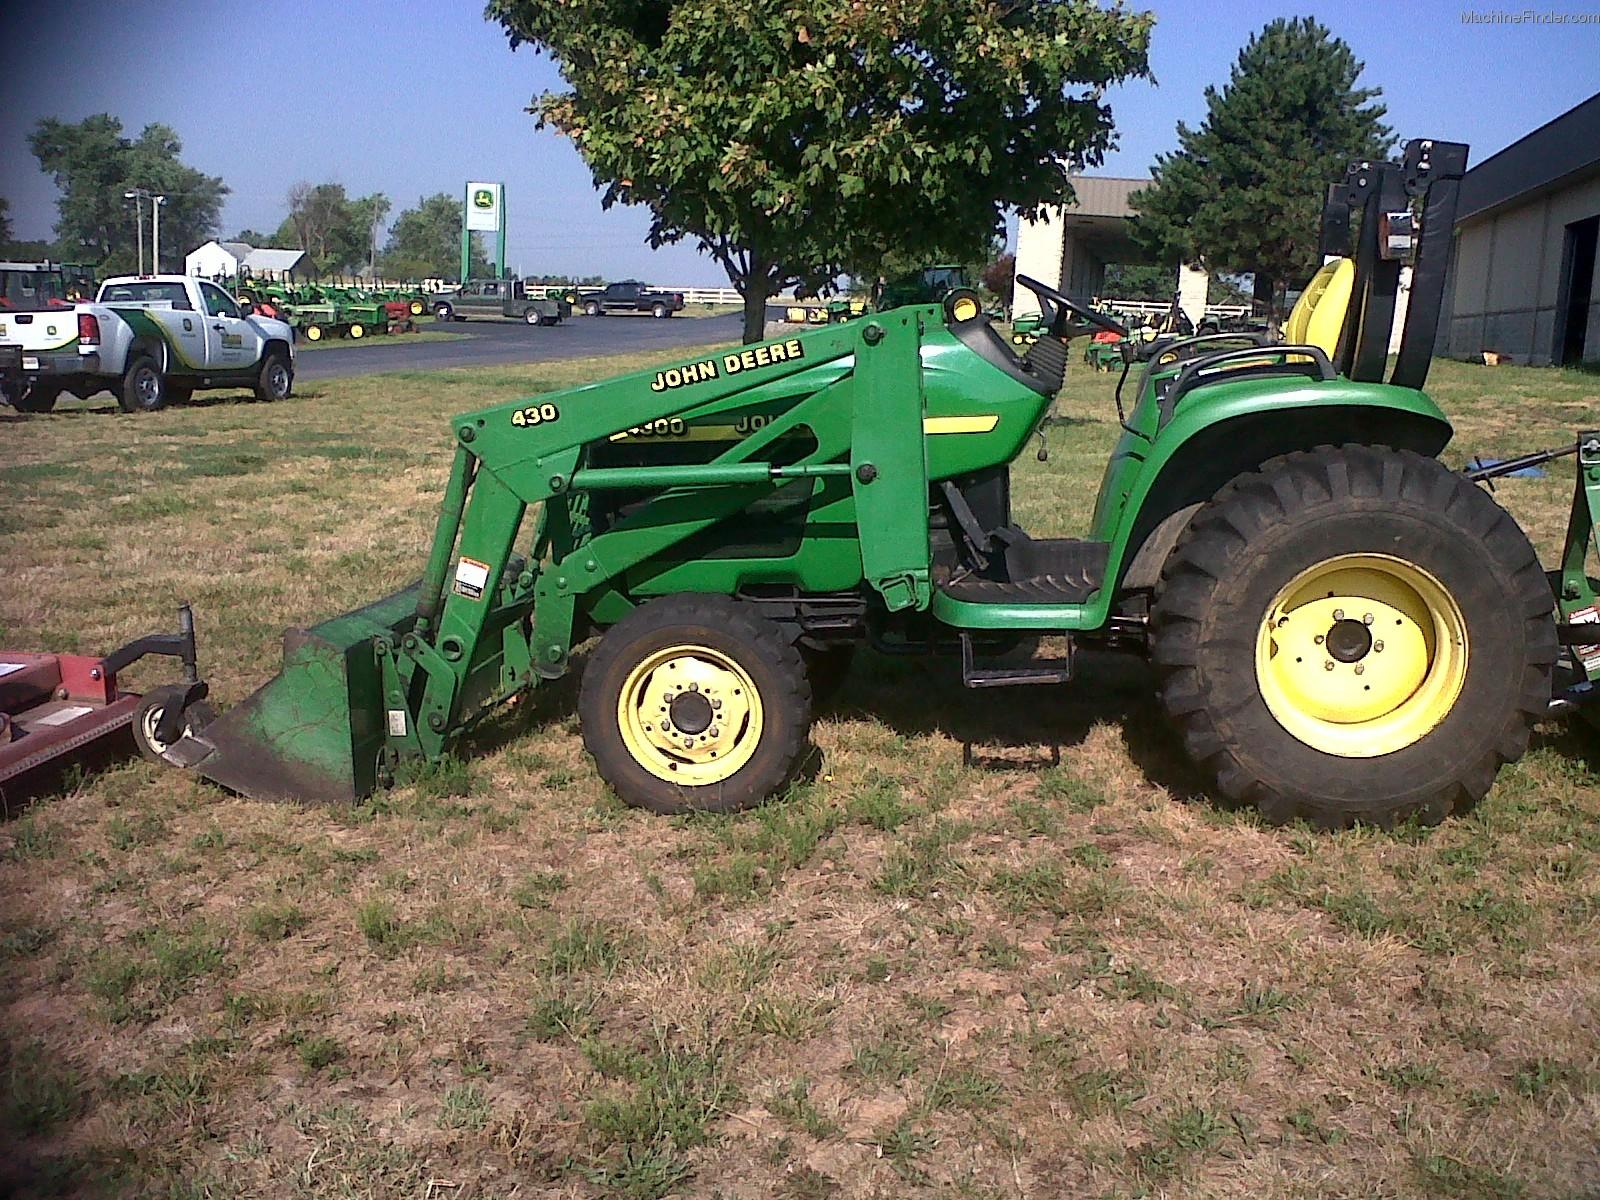 2000 John Deere 4300 Tractors - Compact (1-40hp.) - John ...